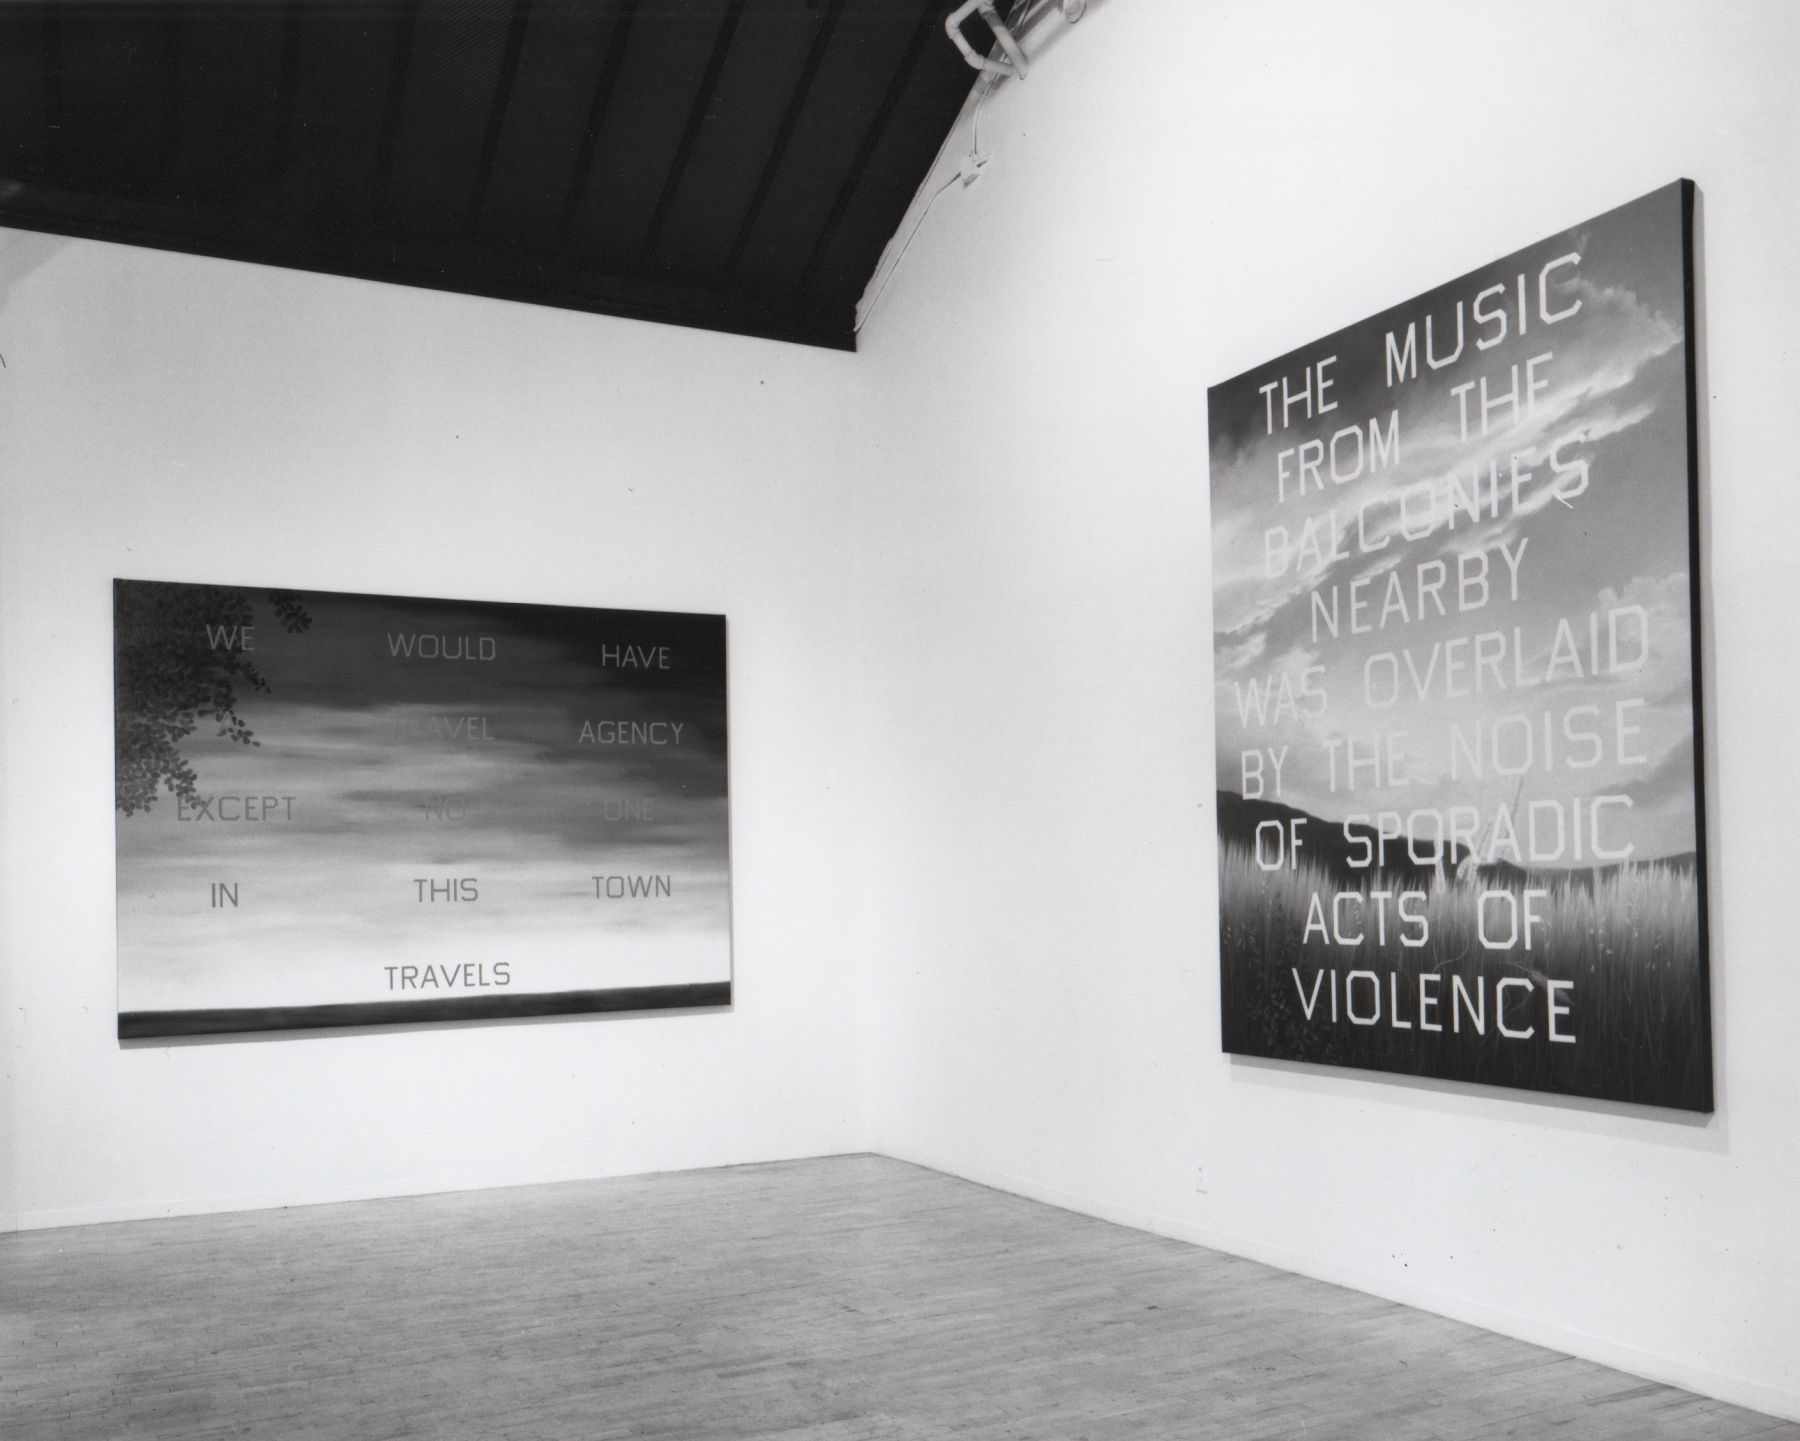 Installation view, Ed Ruscha, 142 GREENE